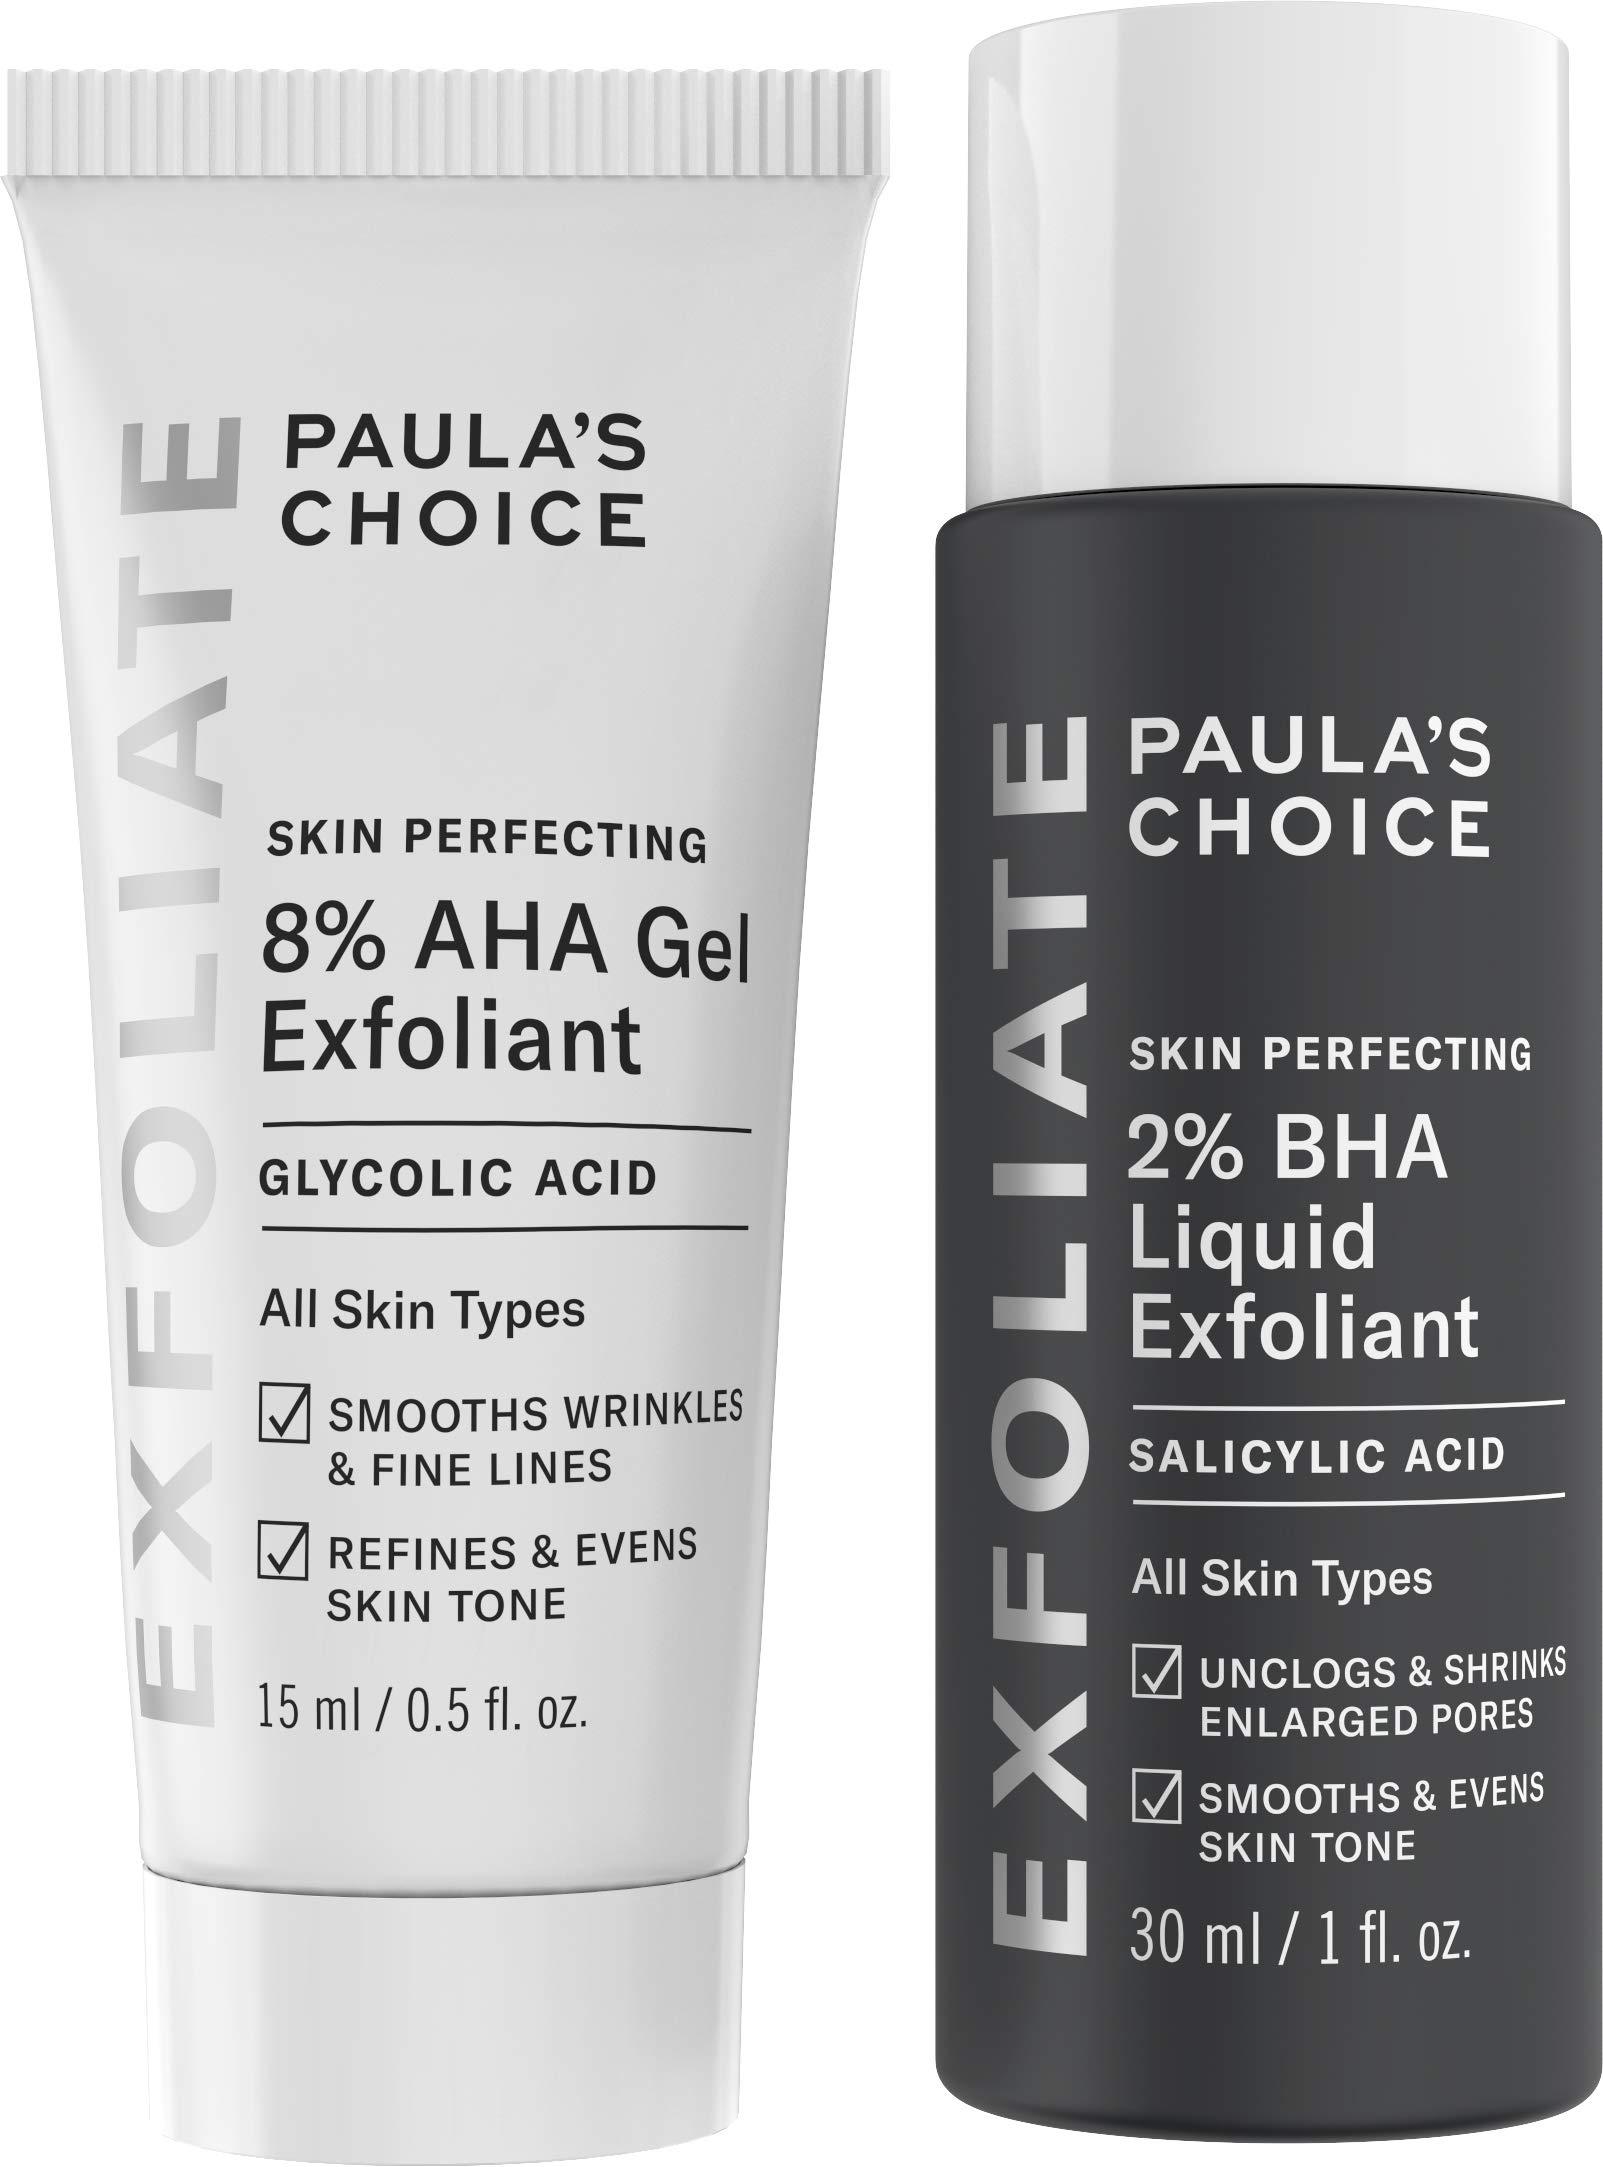 Paula's Choice SKIN PERFECTING 8% AHA Gel Exfoliant & 2% BHA Liquid Travel Duo, Facial Exfoliants for Blackheads & Wrinkles, Face Exfoliators w/Glycolic Acid Salicylic Acid by PAULA'S CHOICE